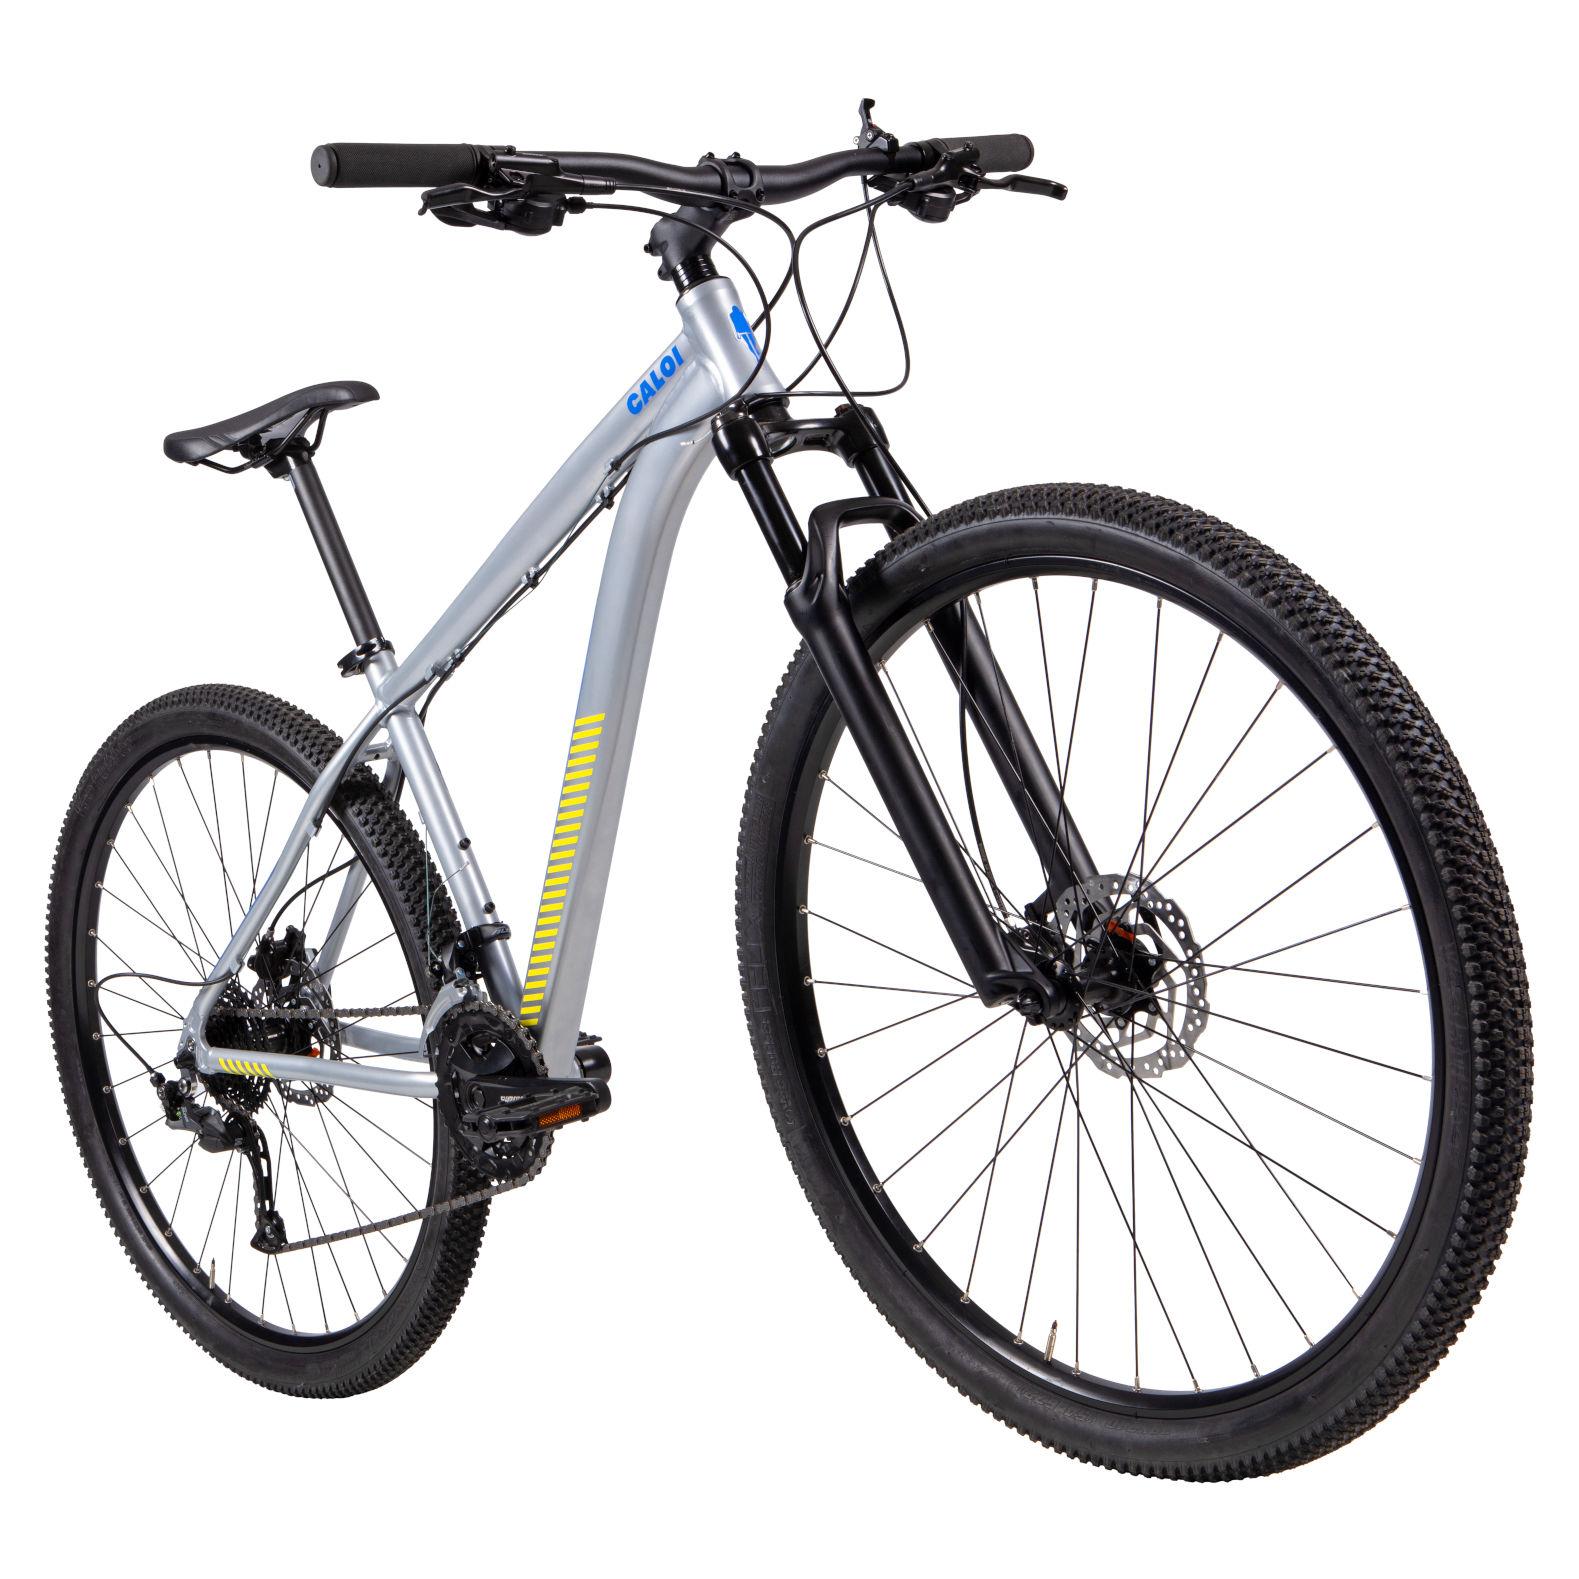 Bicicleta MTB Caloi Atacama 27v Shimano 2021 Q3